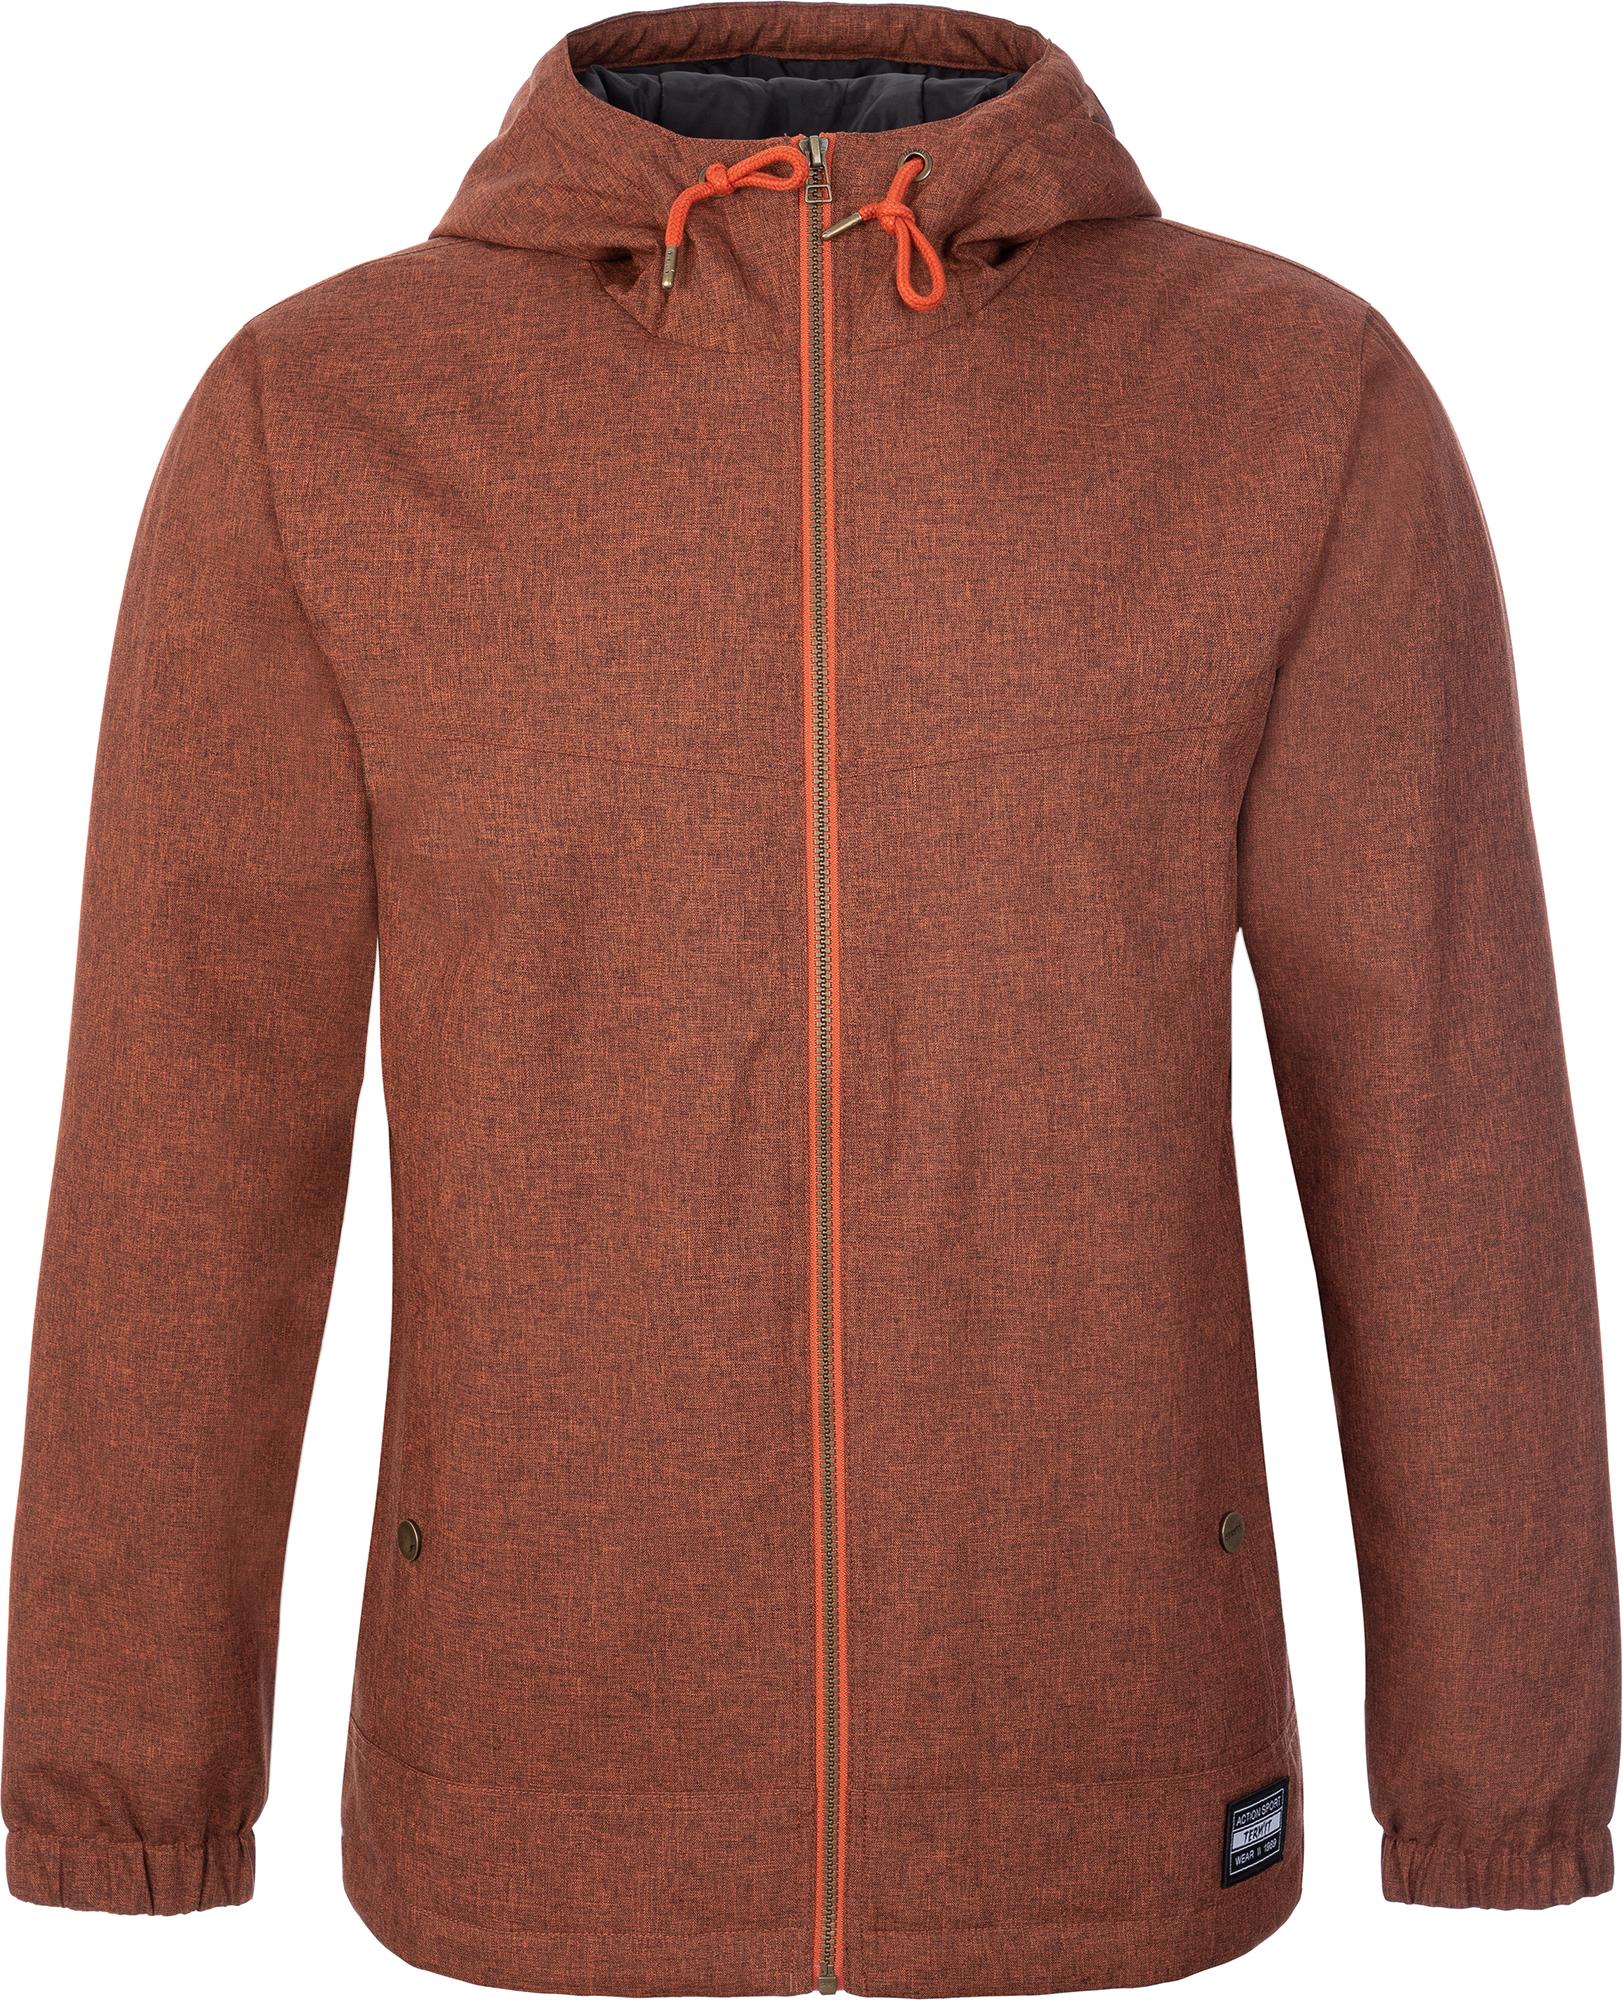 Termit Куртка утепленная мужская Termit, размер 52 цена и фото